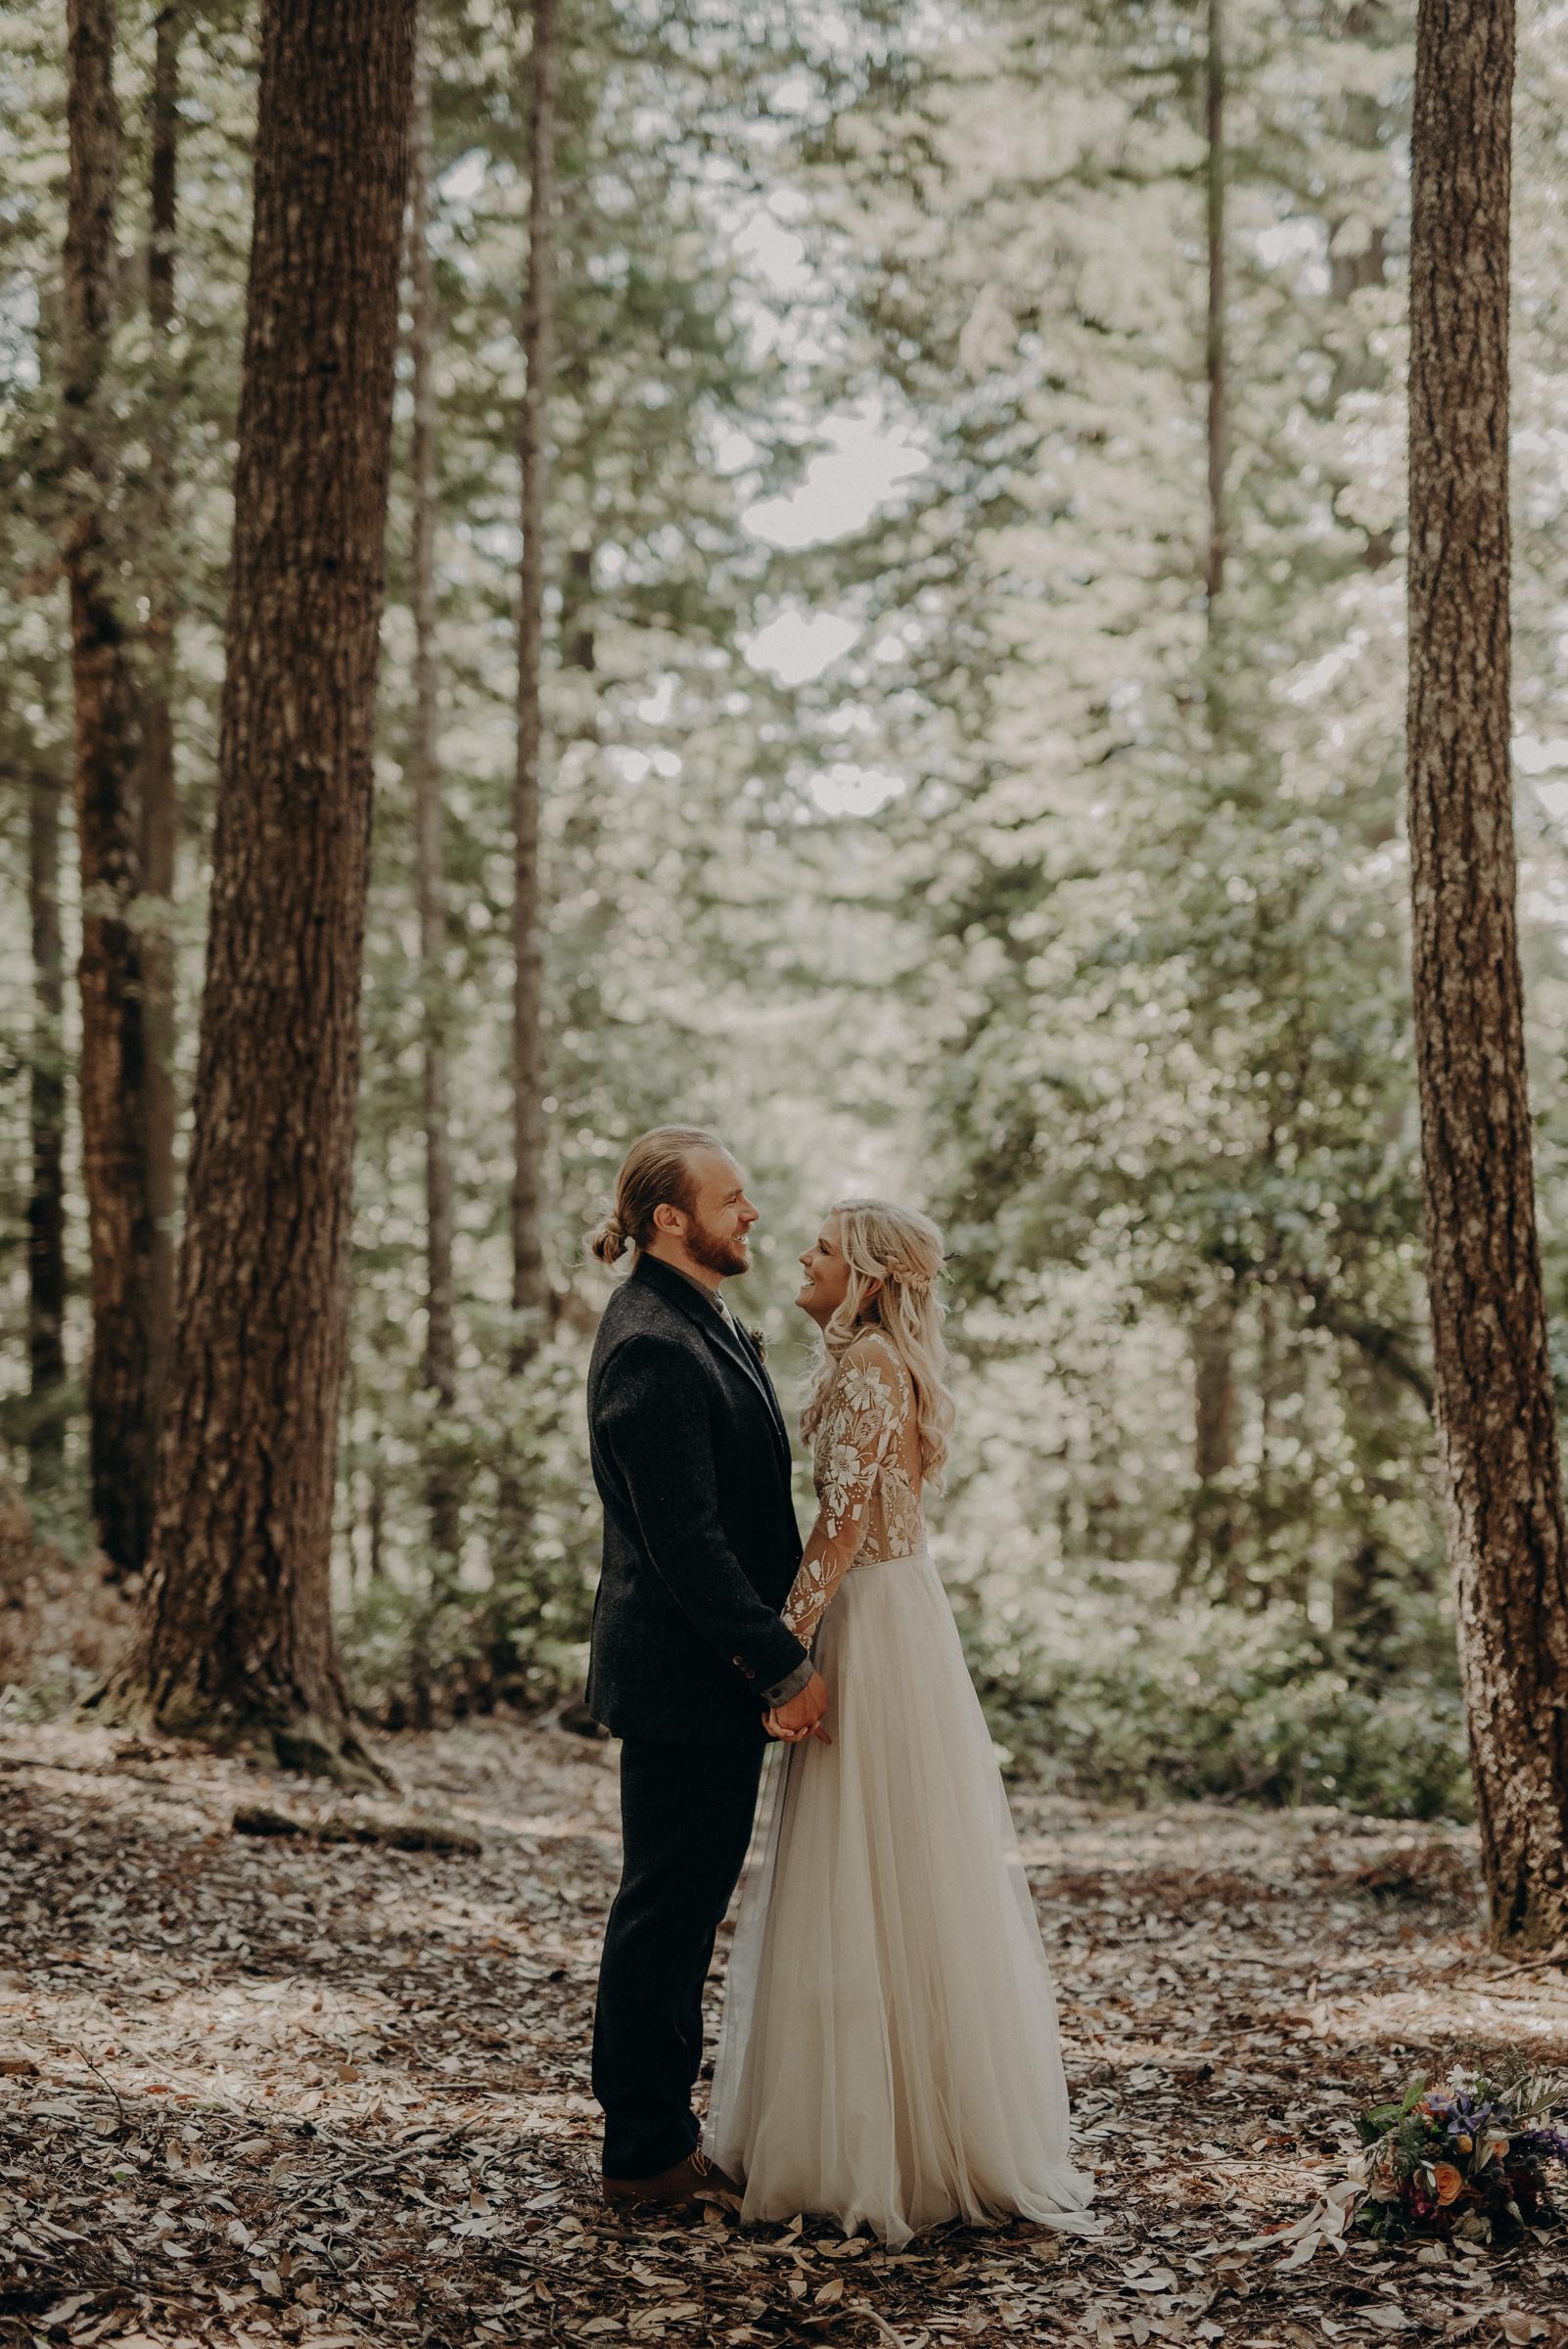 IsaiahAndTaylor.com - California Destination Elopement, Lake Leonard Reserve Wedding, Ukiah-068.jpg